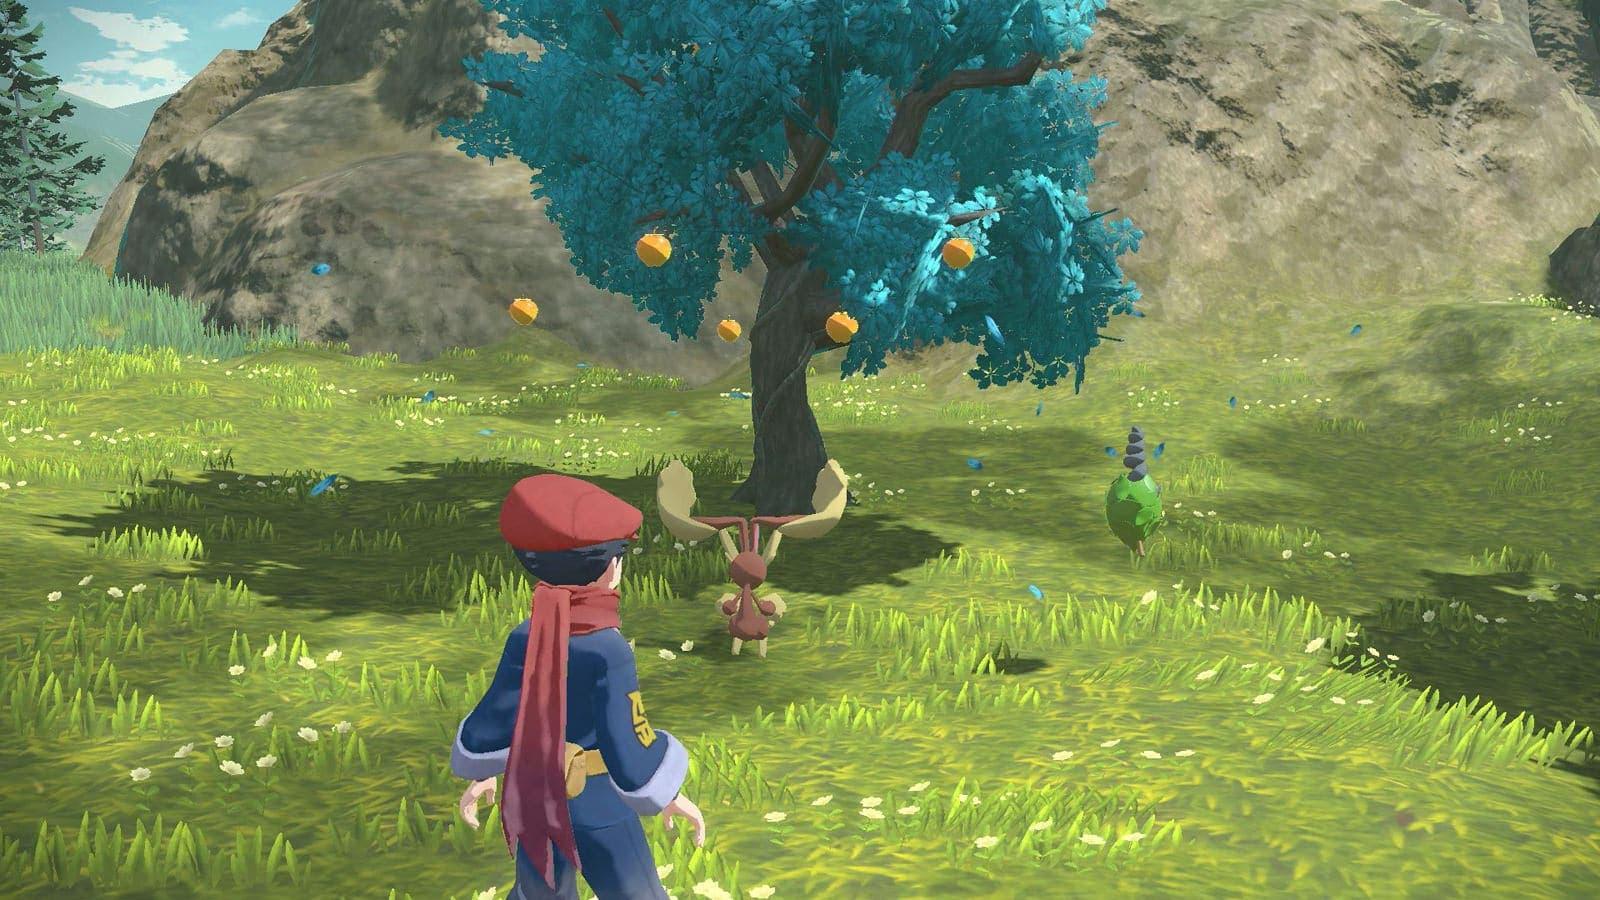 Captura de Leyendas Pokémon: Arceus confirma toneladas de detalles pero confunde con estos números